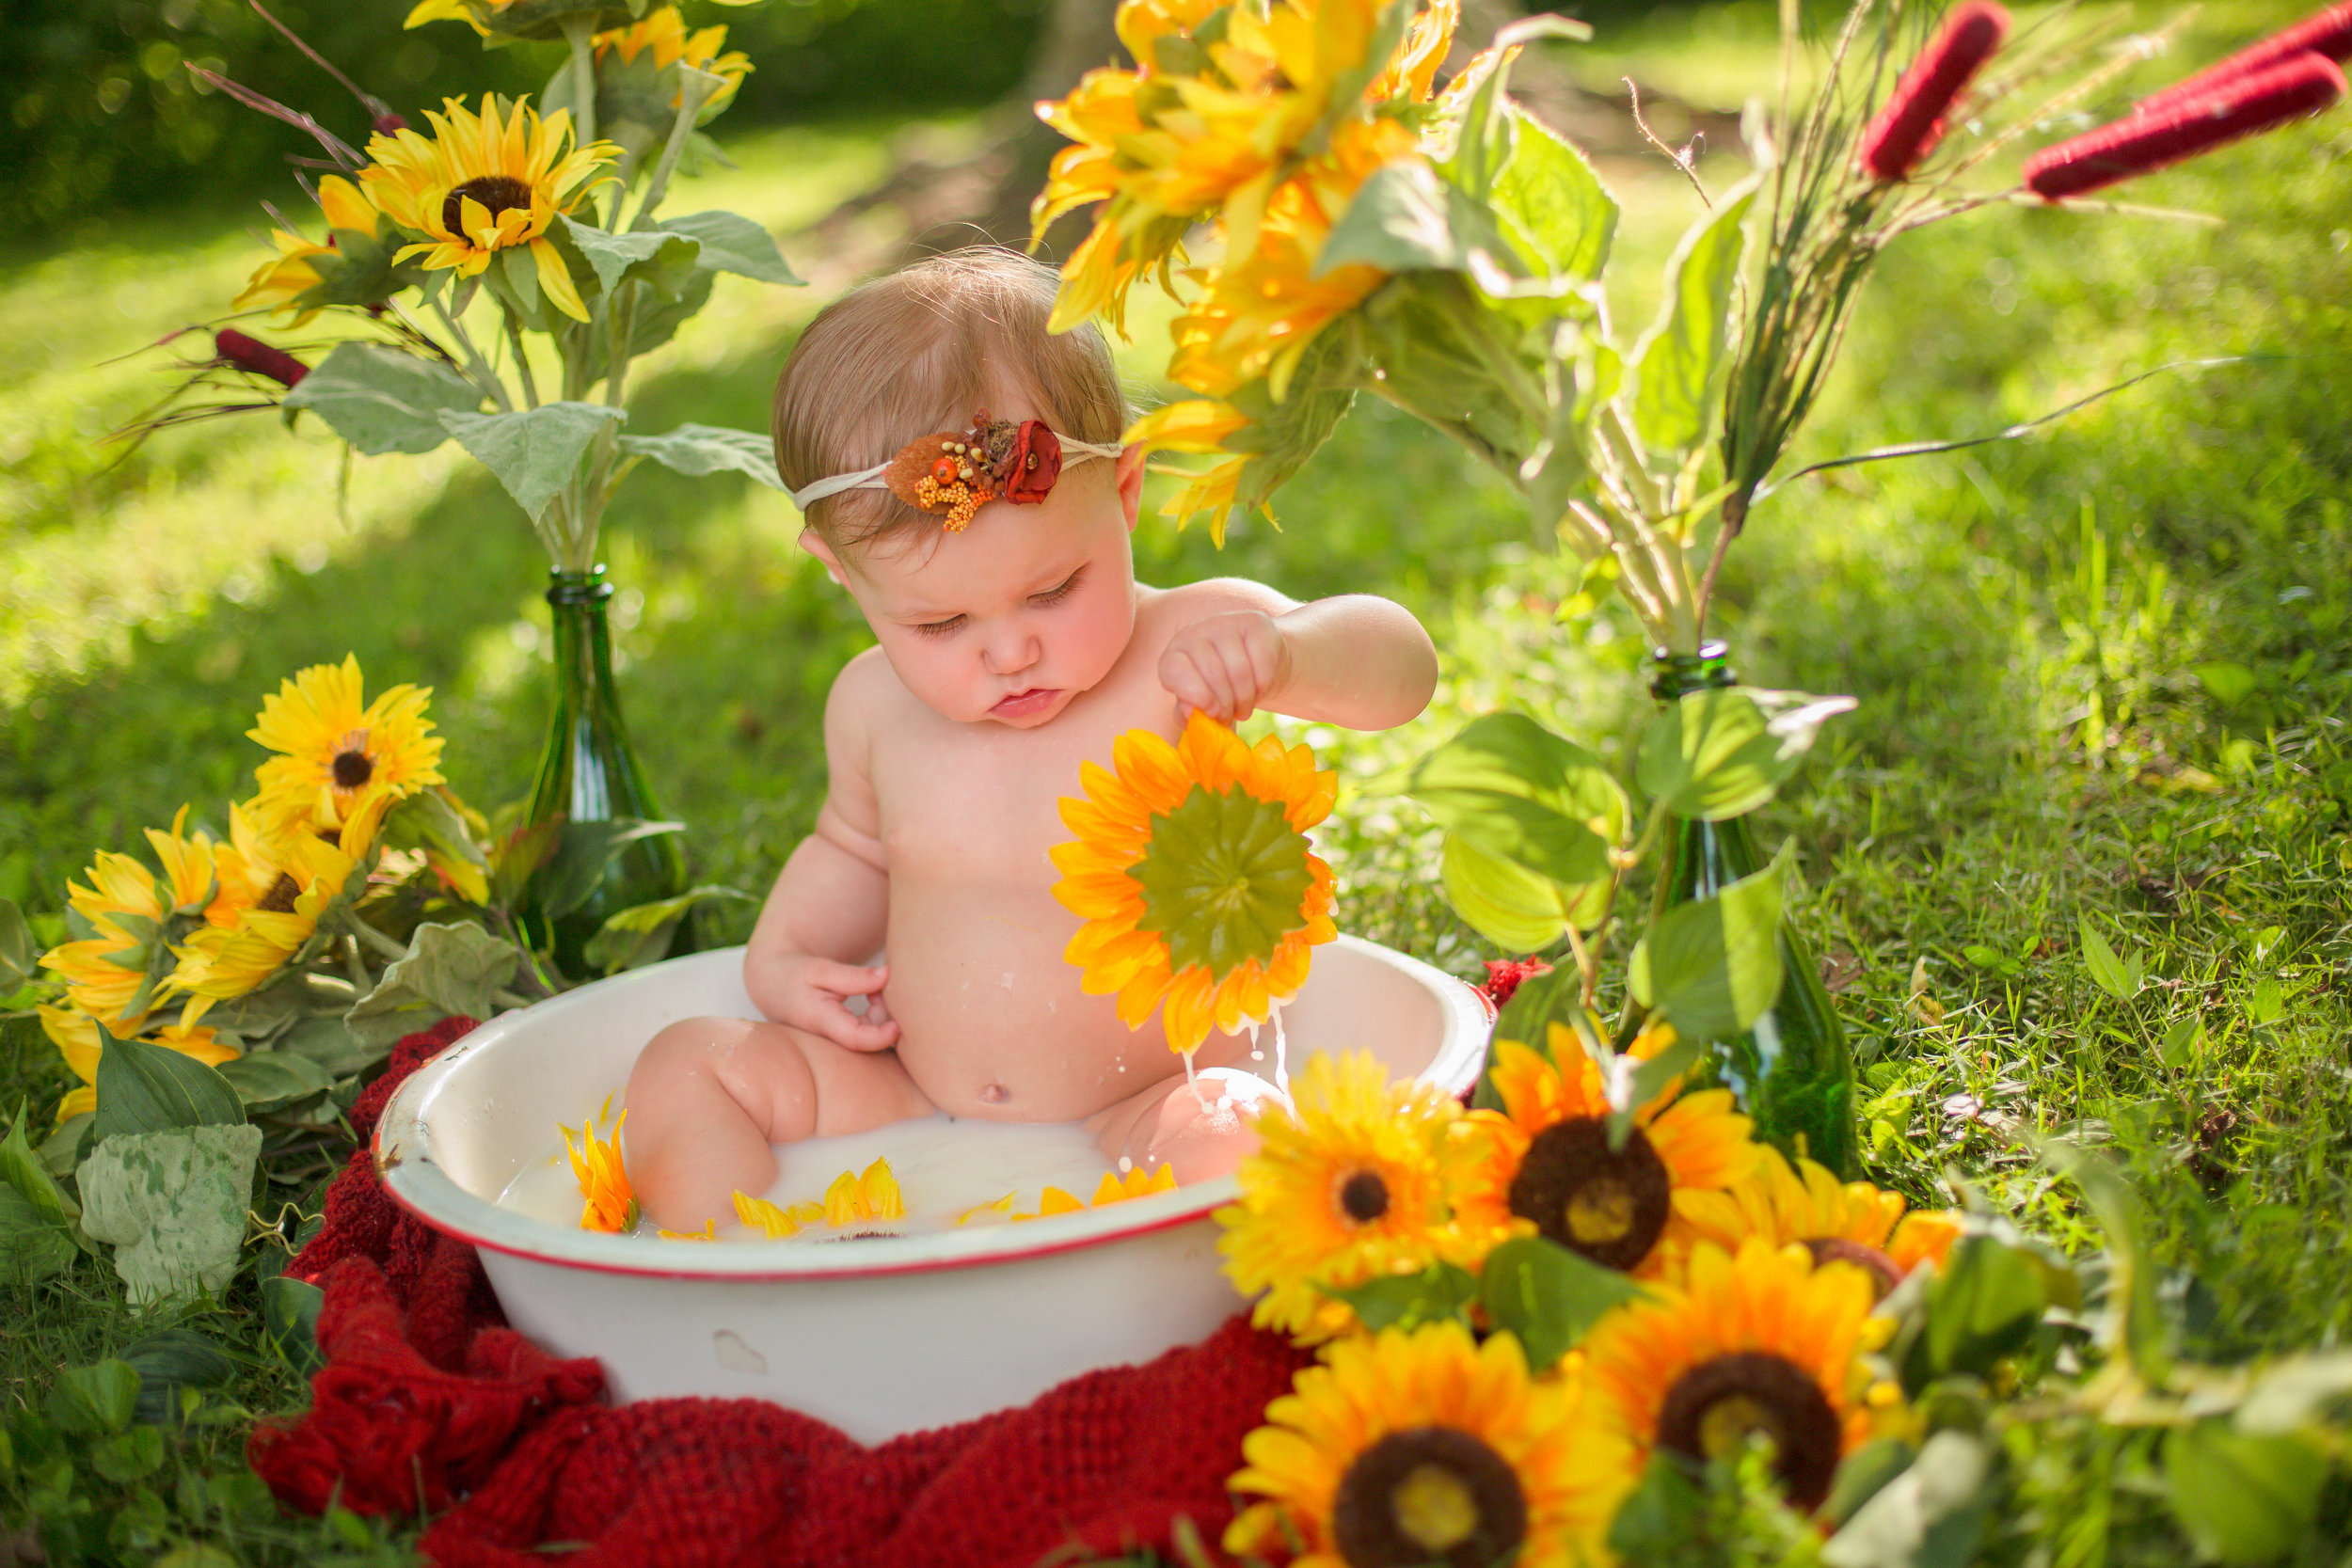 Sawyer-Jo-Sunflower-Milk-bath-Nashville-Family-Photographer-Chelsea-Meadows-Photography-(13).jpg